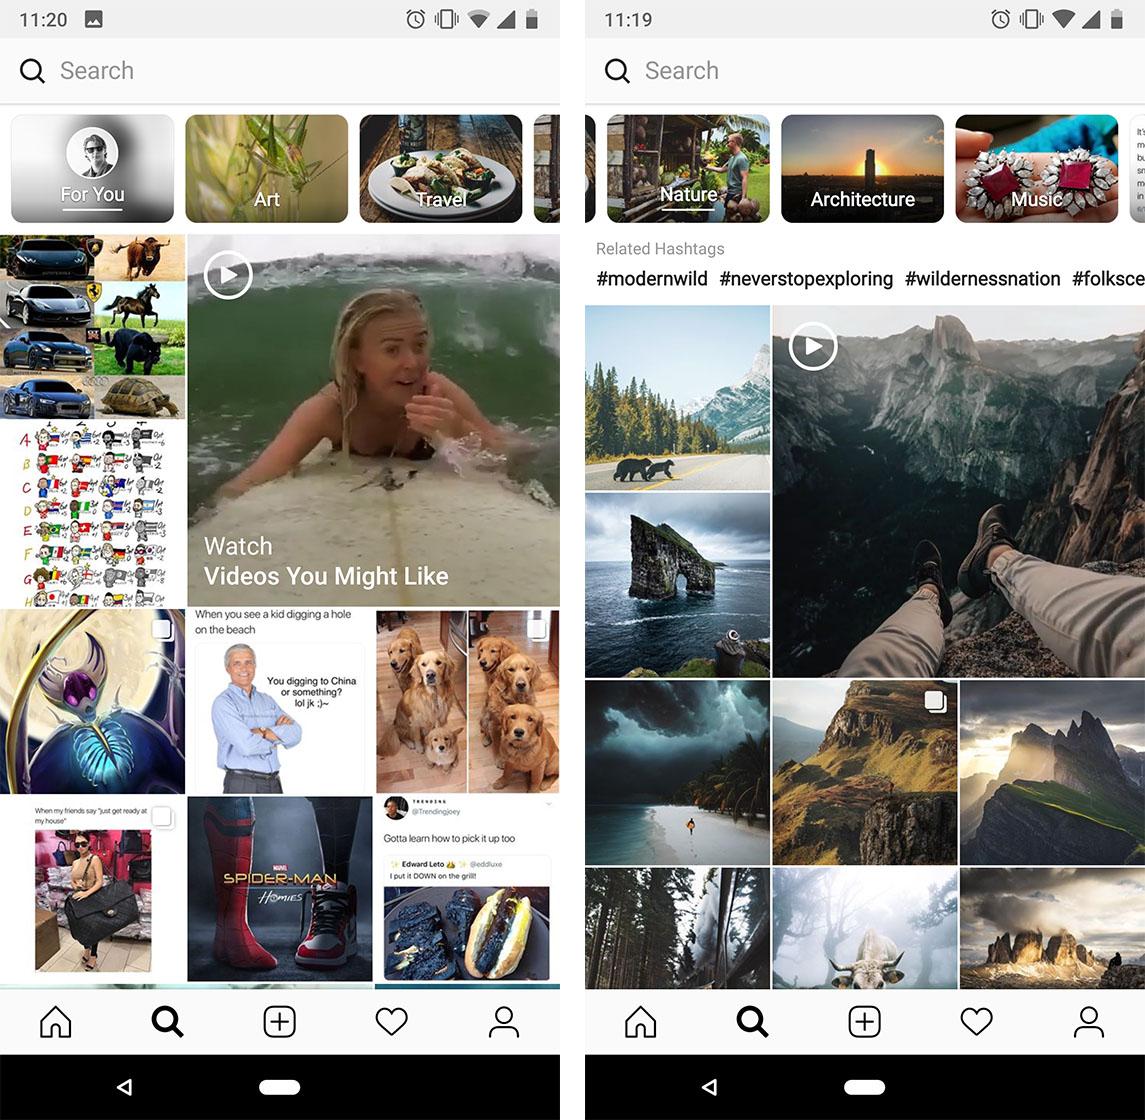 Instagram's Explore tab channels